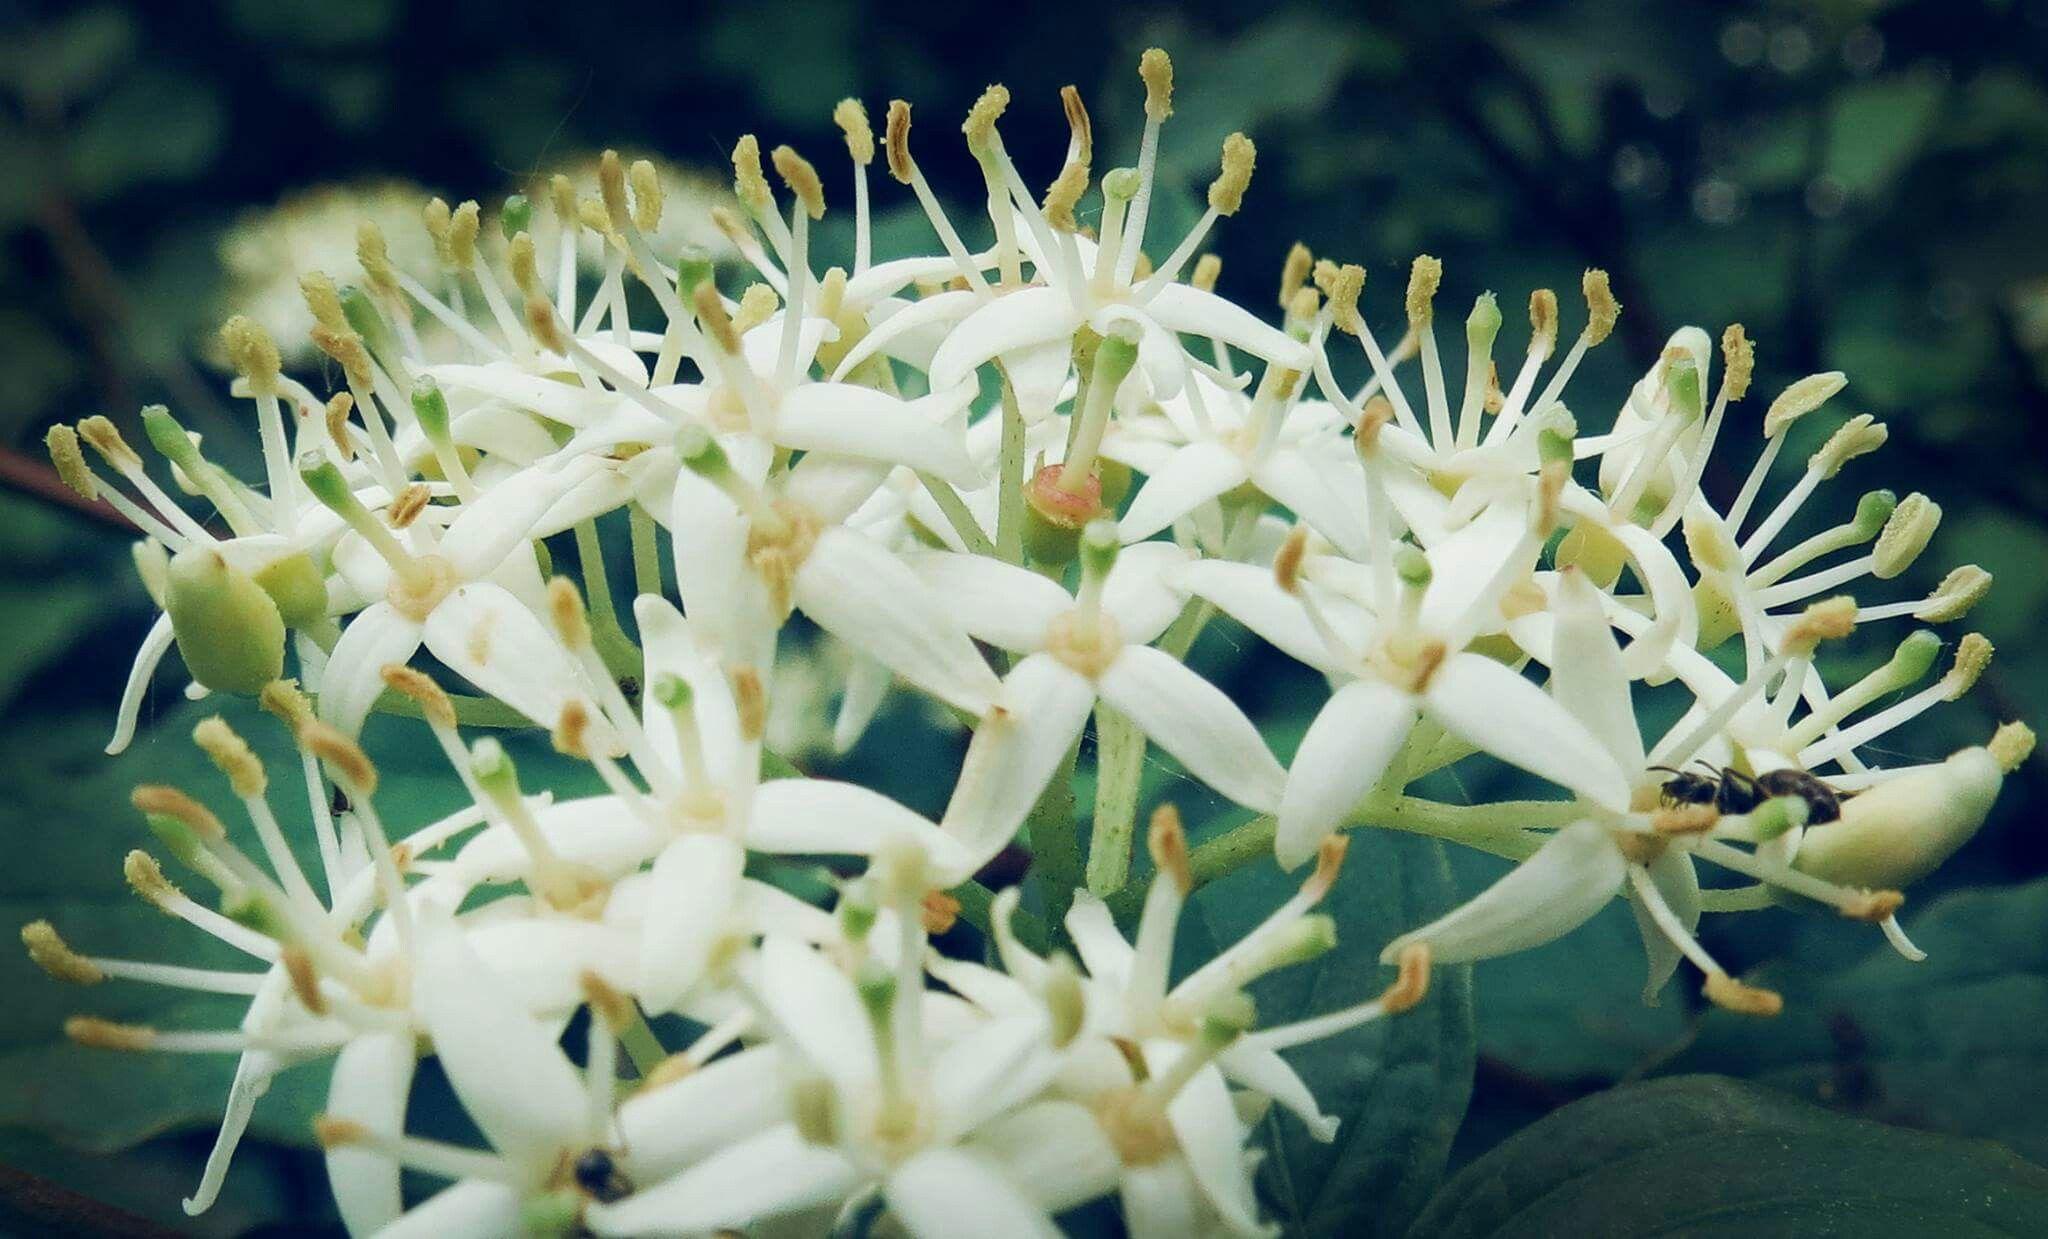 #flowers #photography #pyaar #emofofashion #emofopatsii #barunsobti